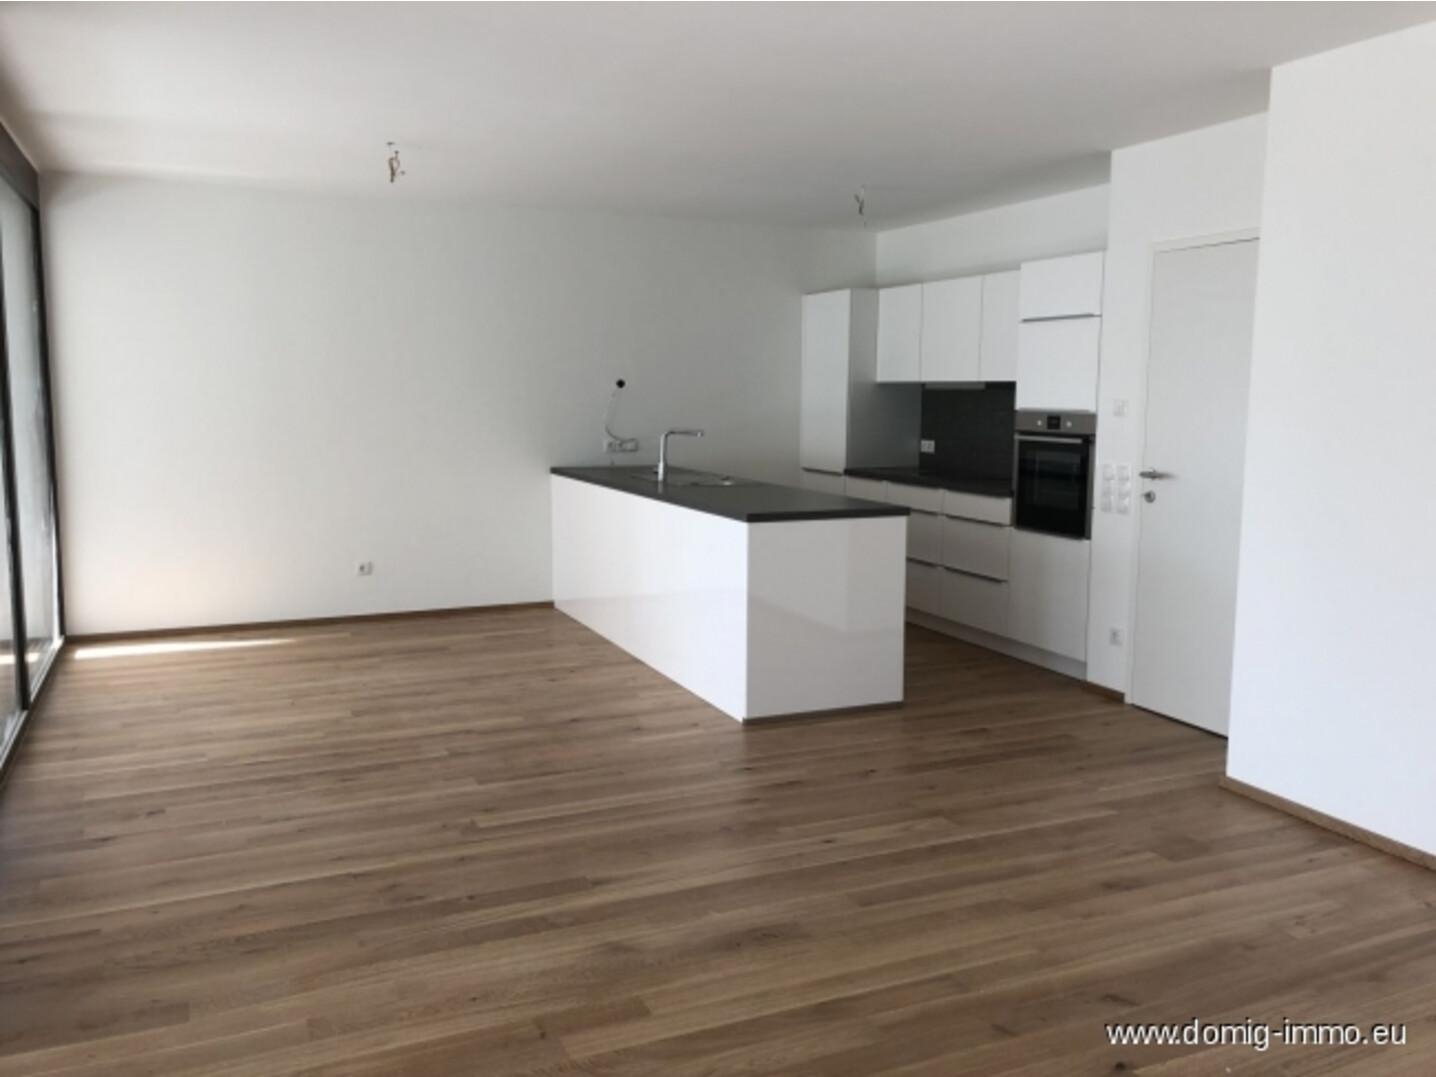 etagenwohnung kauf 79 7 m 3 zimmer 6700 bludenz ort obj nr 651. Black Bedroom Furniture Sets. Home Design Ideas